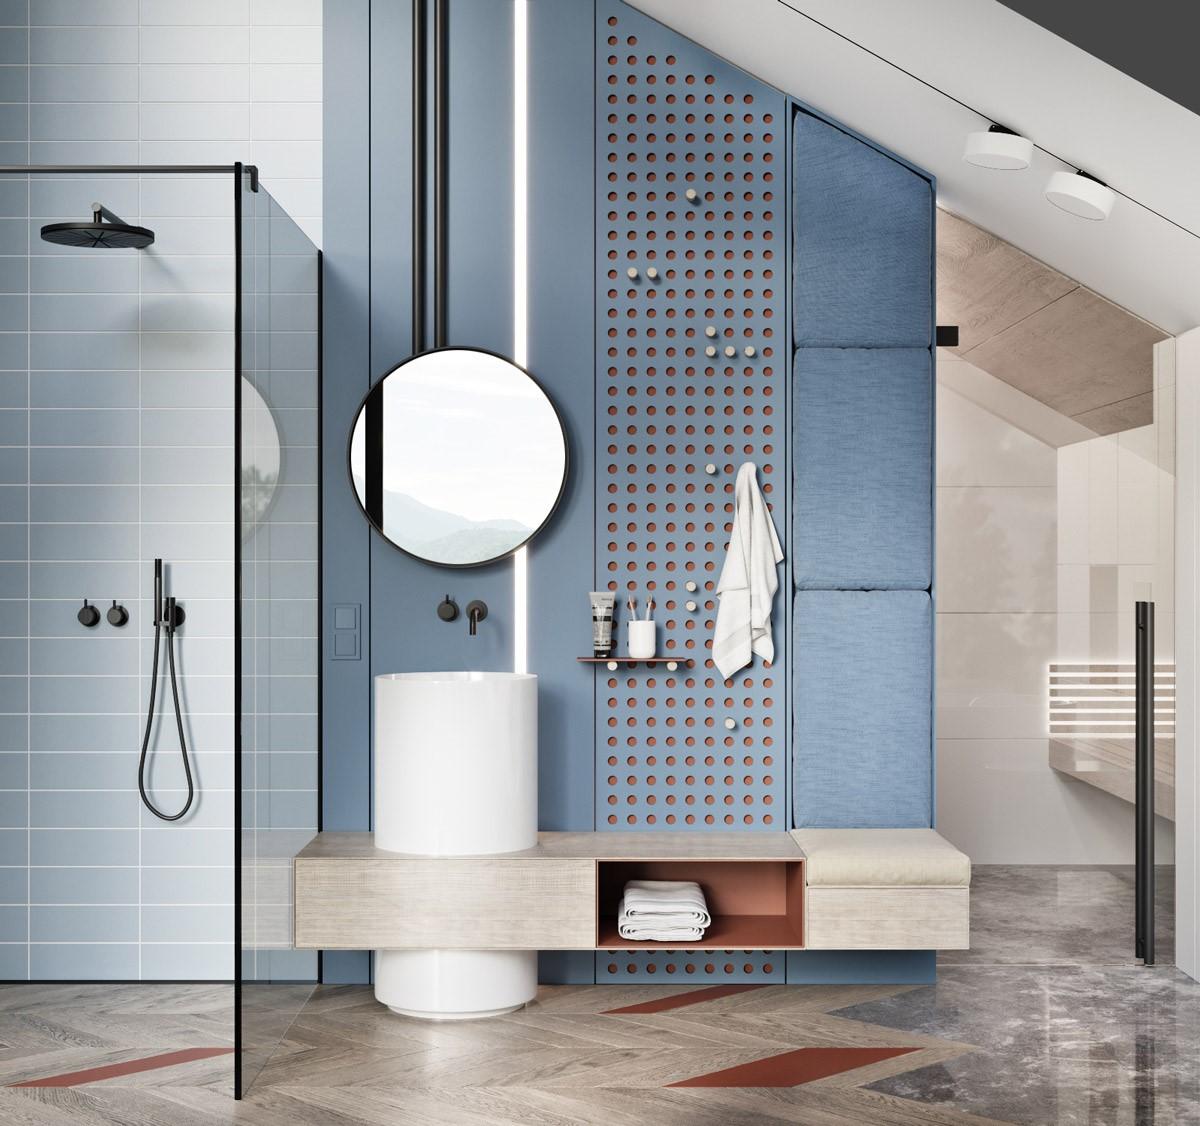 3 Modern Bathroom Vanity Simphome com